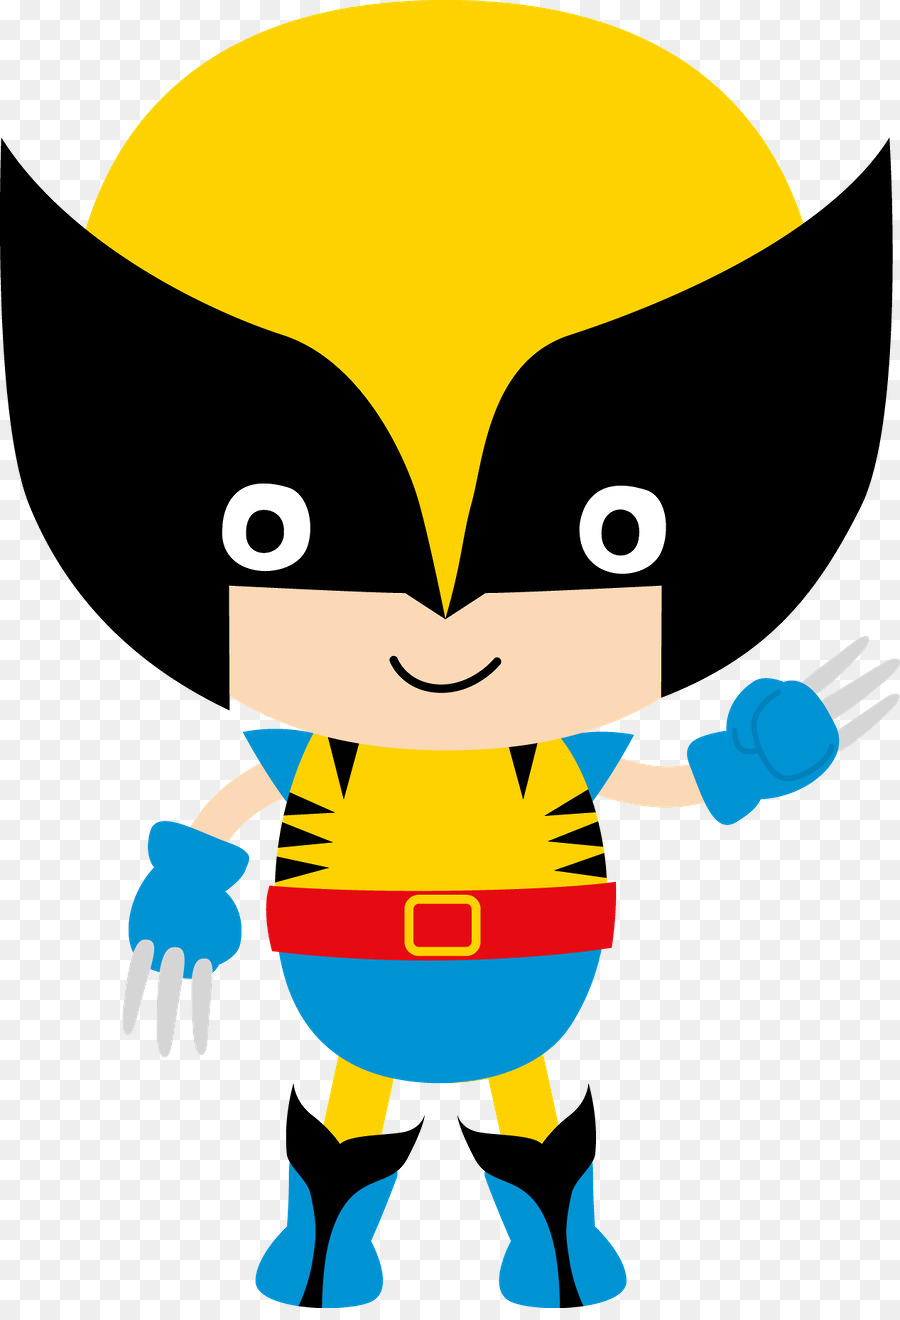 wolverine deadpool superhero clip art wolverine png download 900 rh kisspng com baby wolverine clipart wolverine clip art free